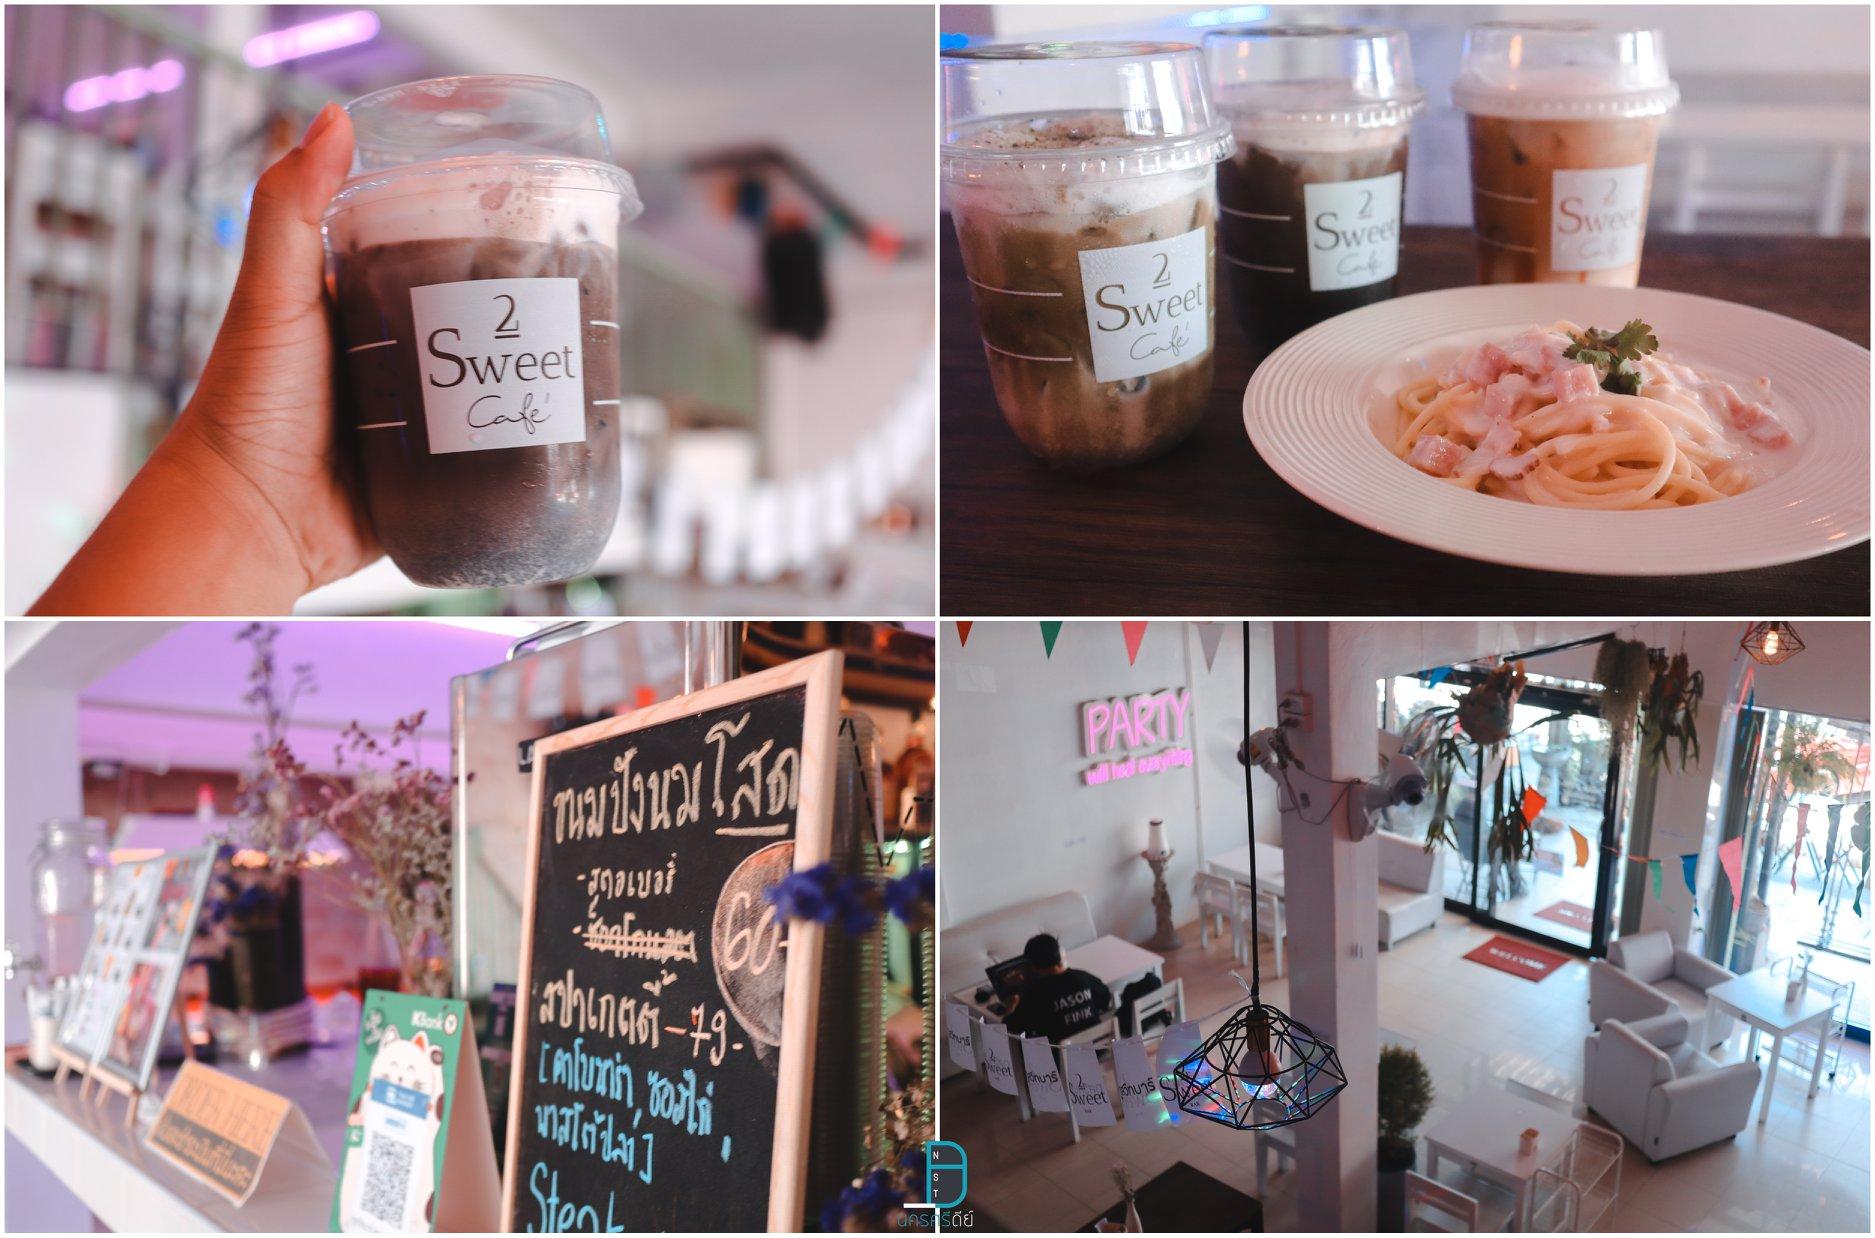 11.-2-sweet-cafe คลิกที่นี่ คาเฟ่,Cafe,นครศรีธรรมราช,2021,2564,ของกิน,จุดเช็คอิน,จุดถ่ายรูป